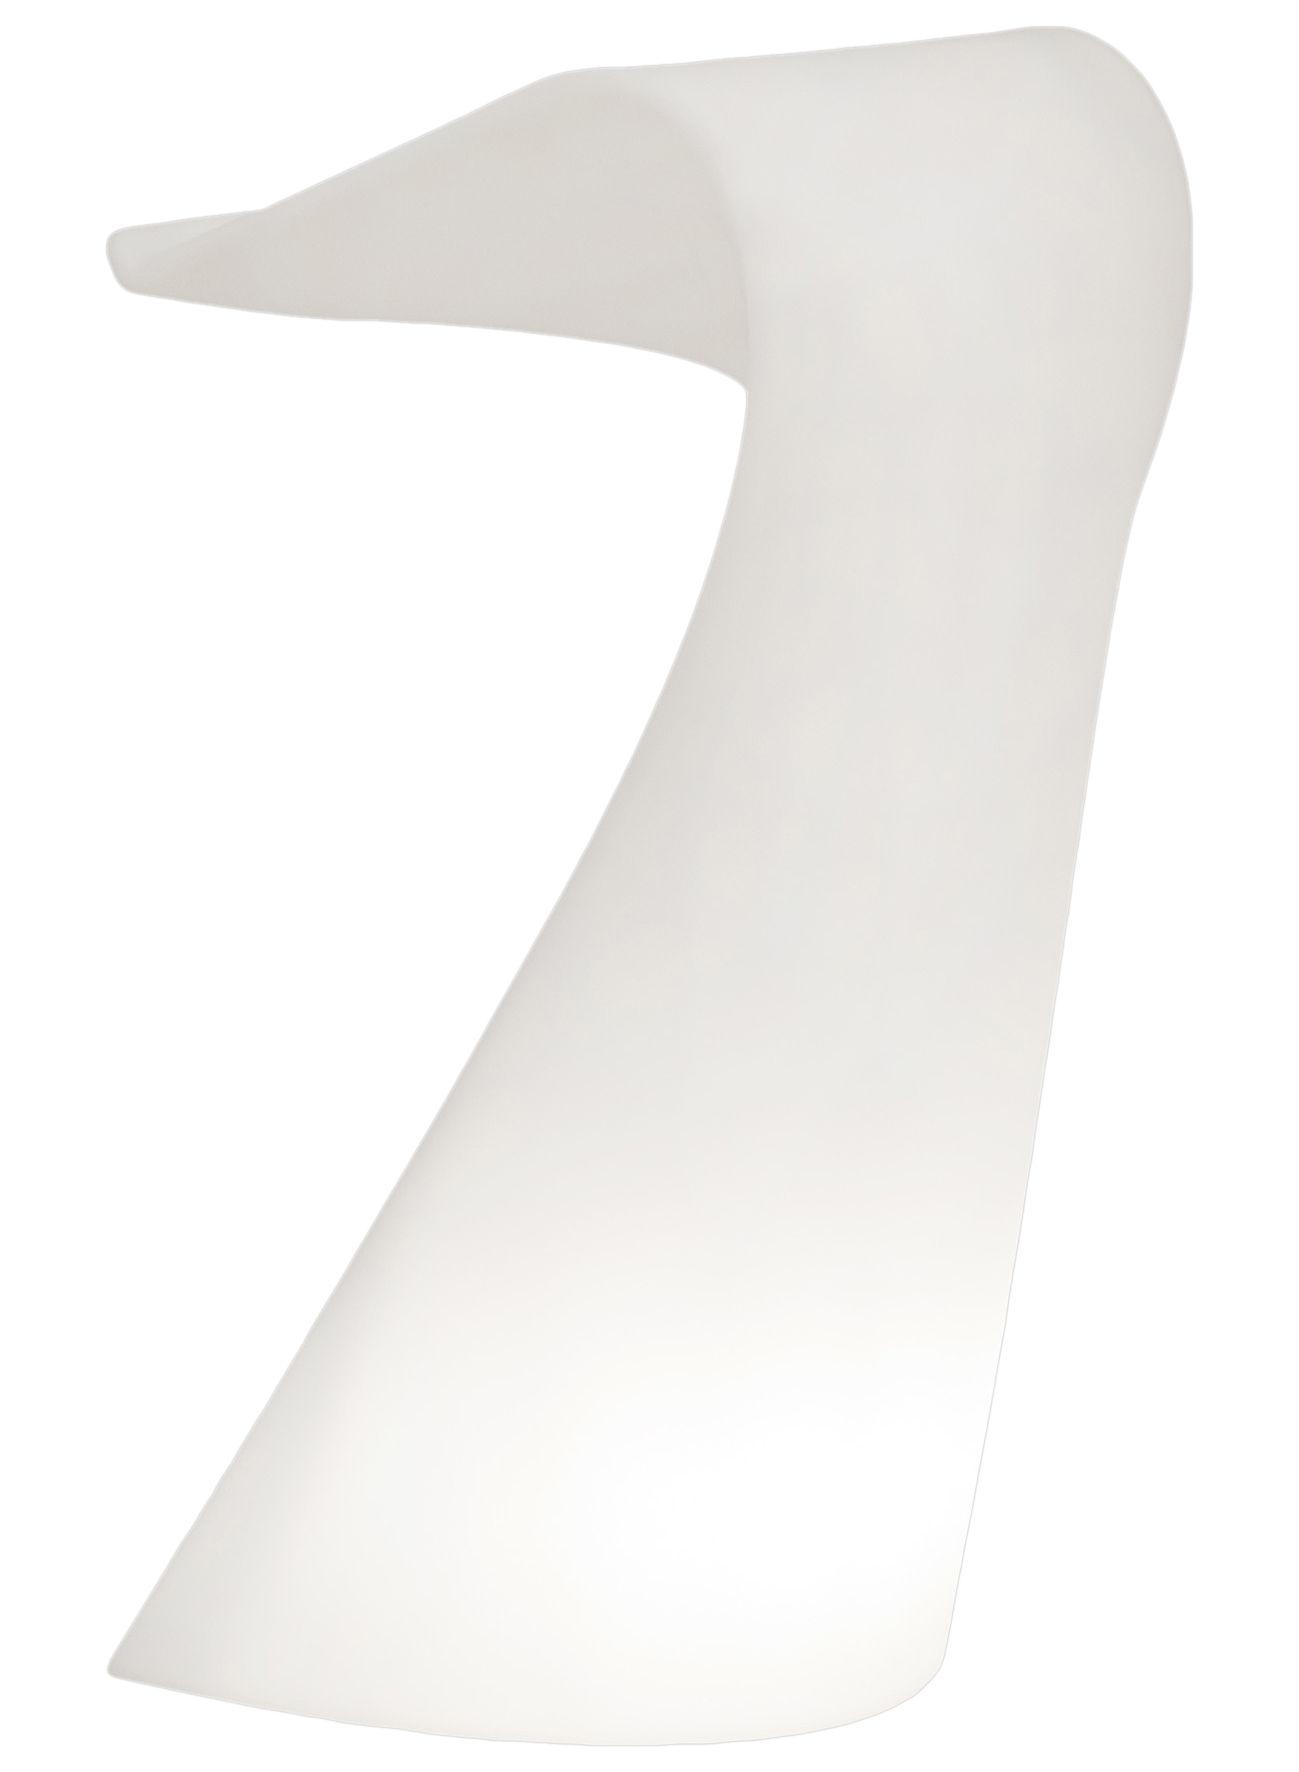 Möbel - Büromöbel - Swish Pult - Slide - Weiß - recycelbares Polyethen